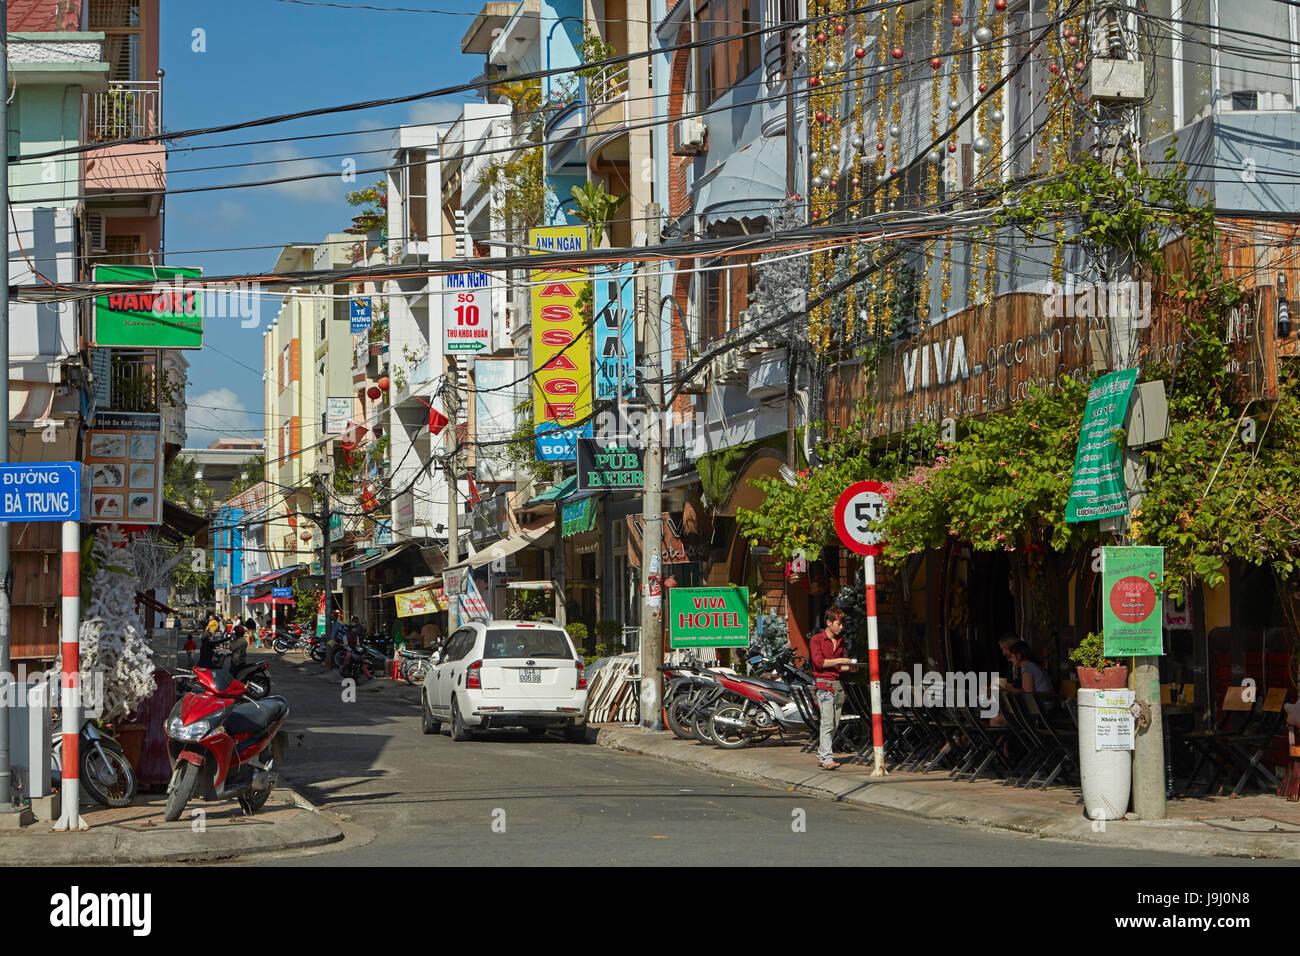 Narrow street, Can Tho, Mekong Delta, Vietnam - Stock Image